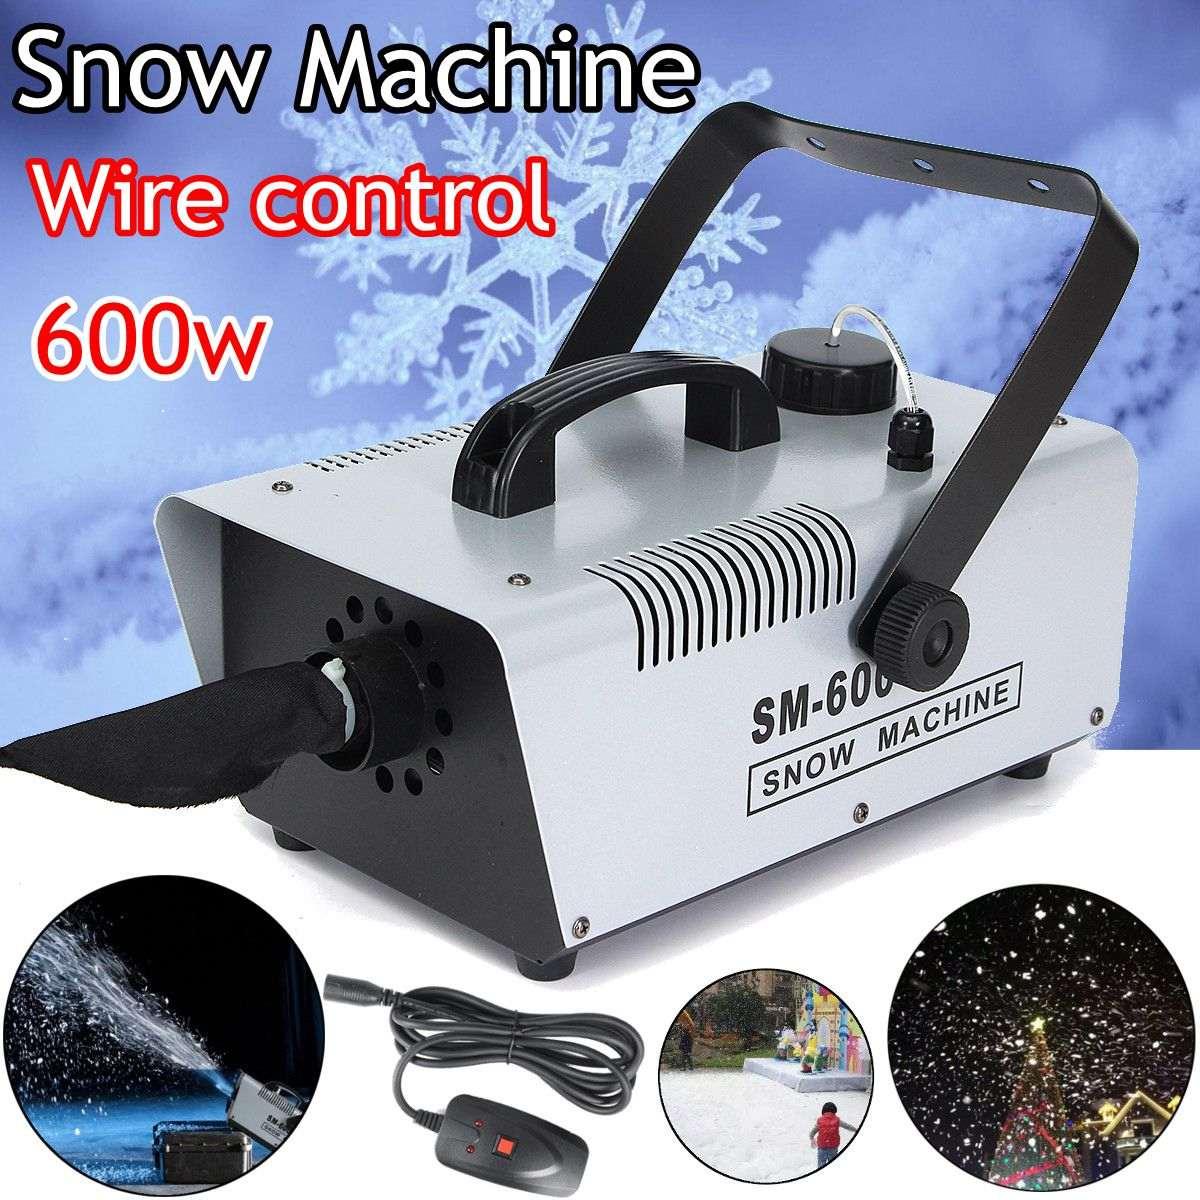 110V/220V 600W Mini Flurry Snow Machine Stage Effect + Wired Remote for Holiday Stage Show mini 600w snow machine pro snow snowflake snow maker machine stage dj party show